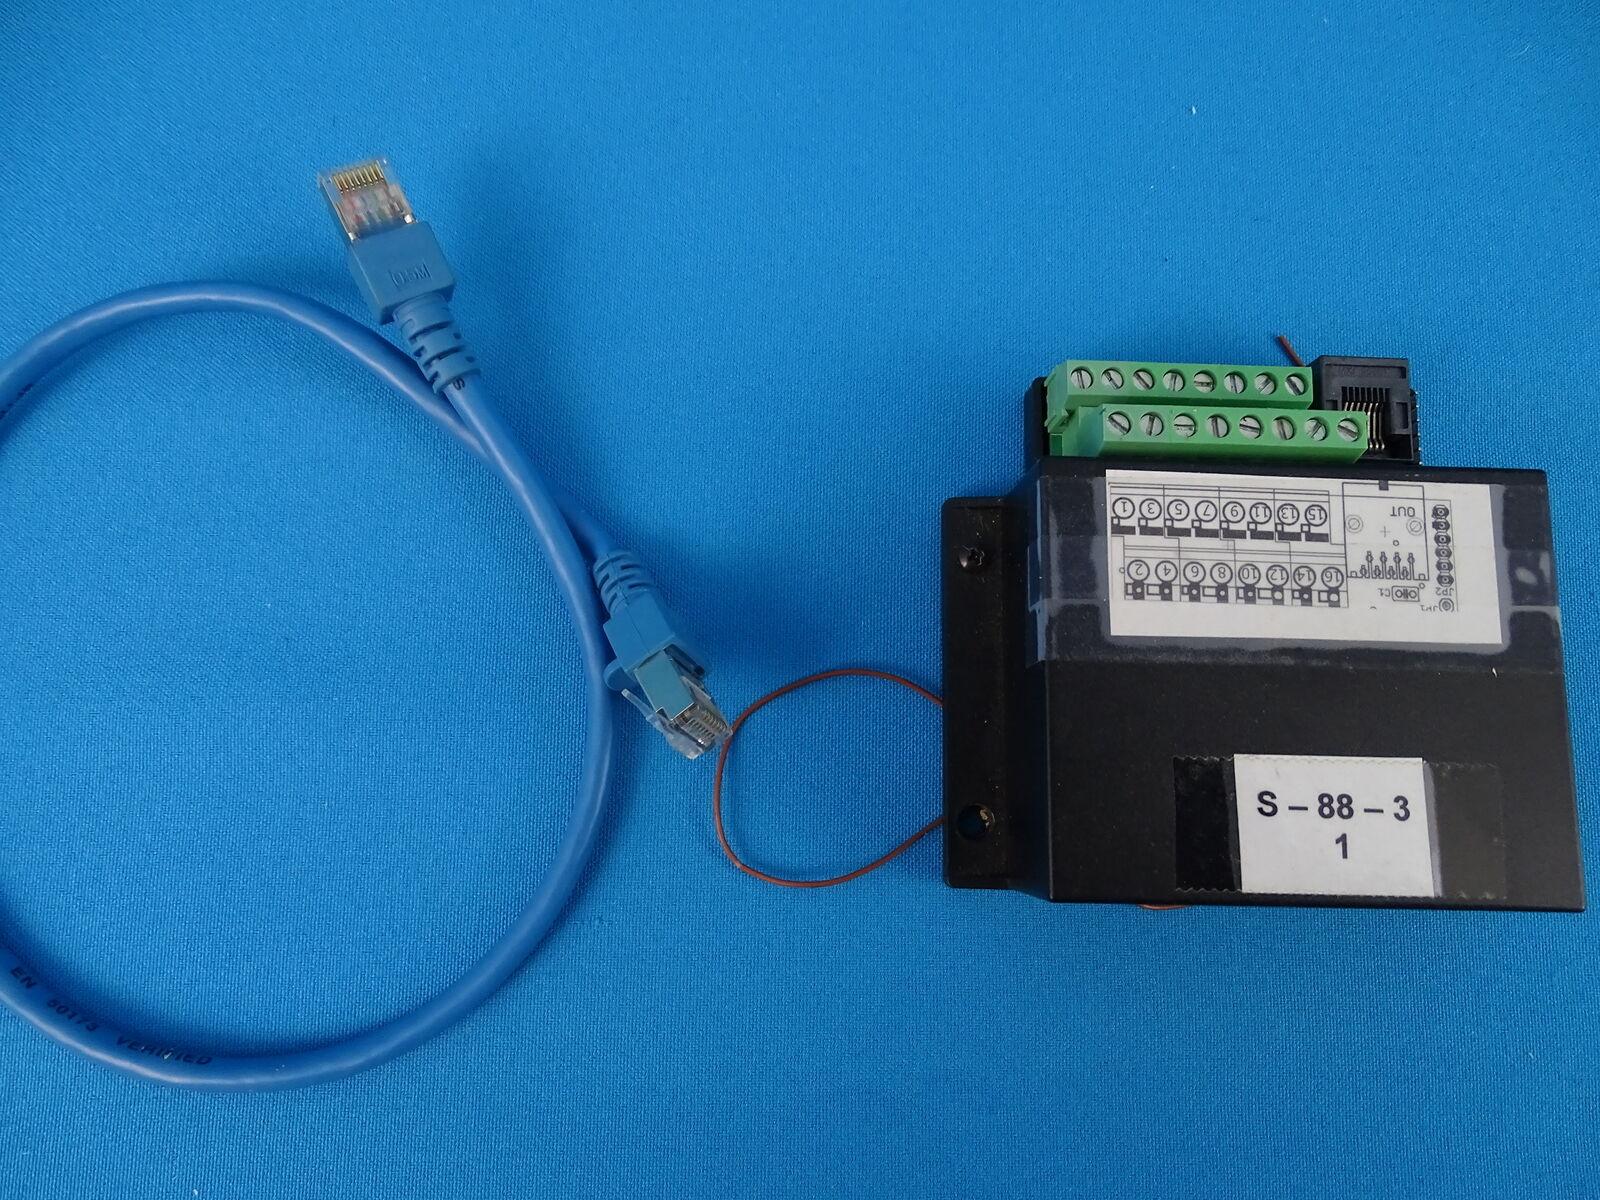 TAMS 44-01307-01 Elektronik S-88-3 terugmelding Decoder DIGITAL